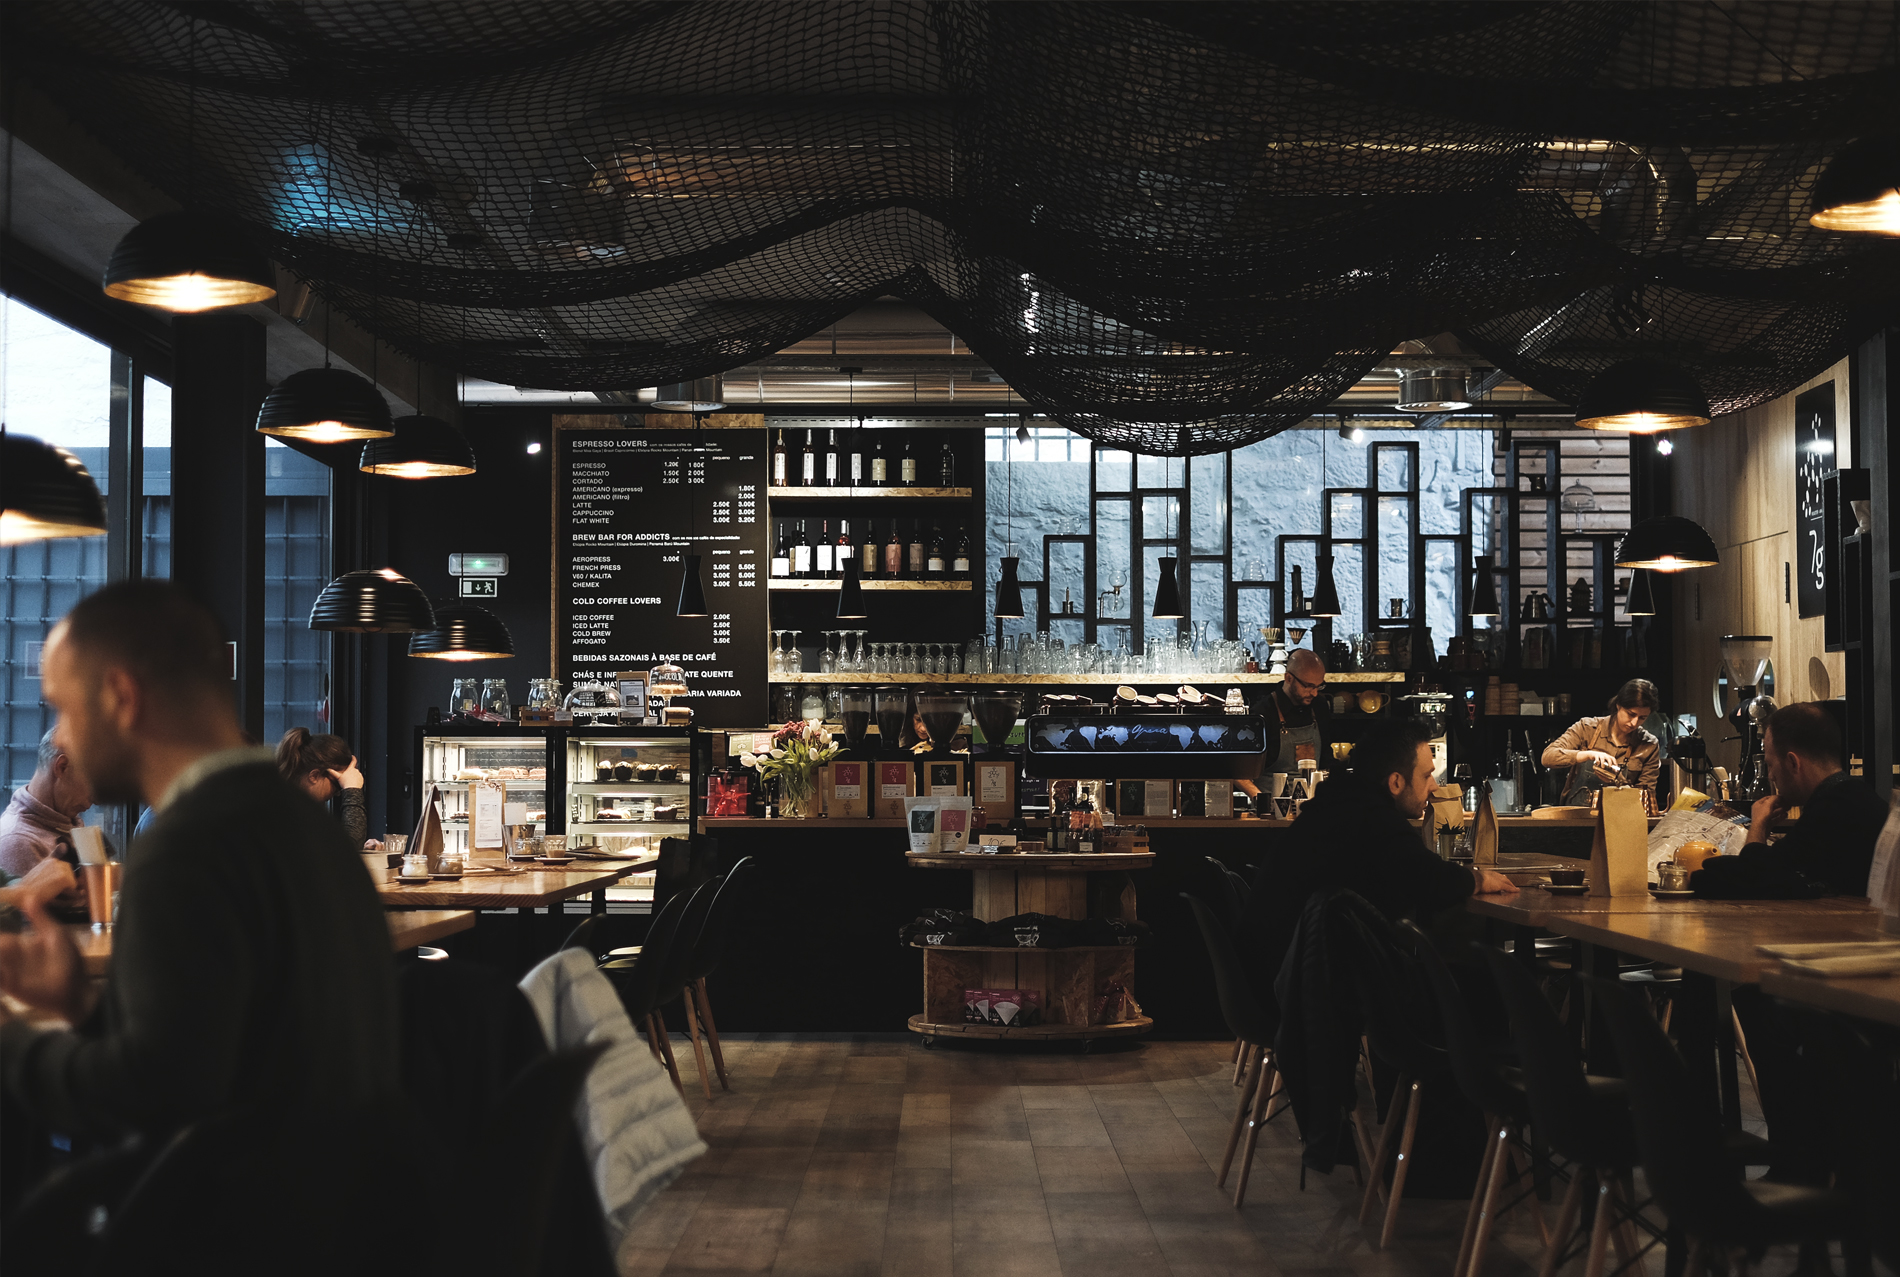 7g cafe